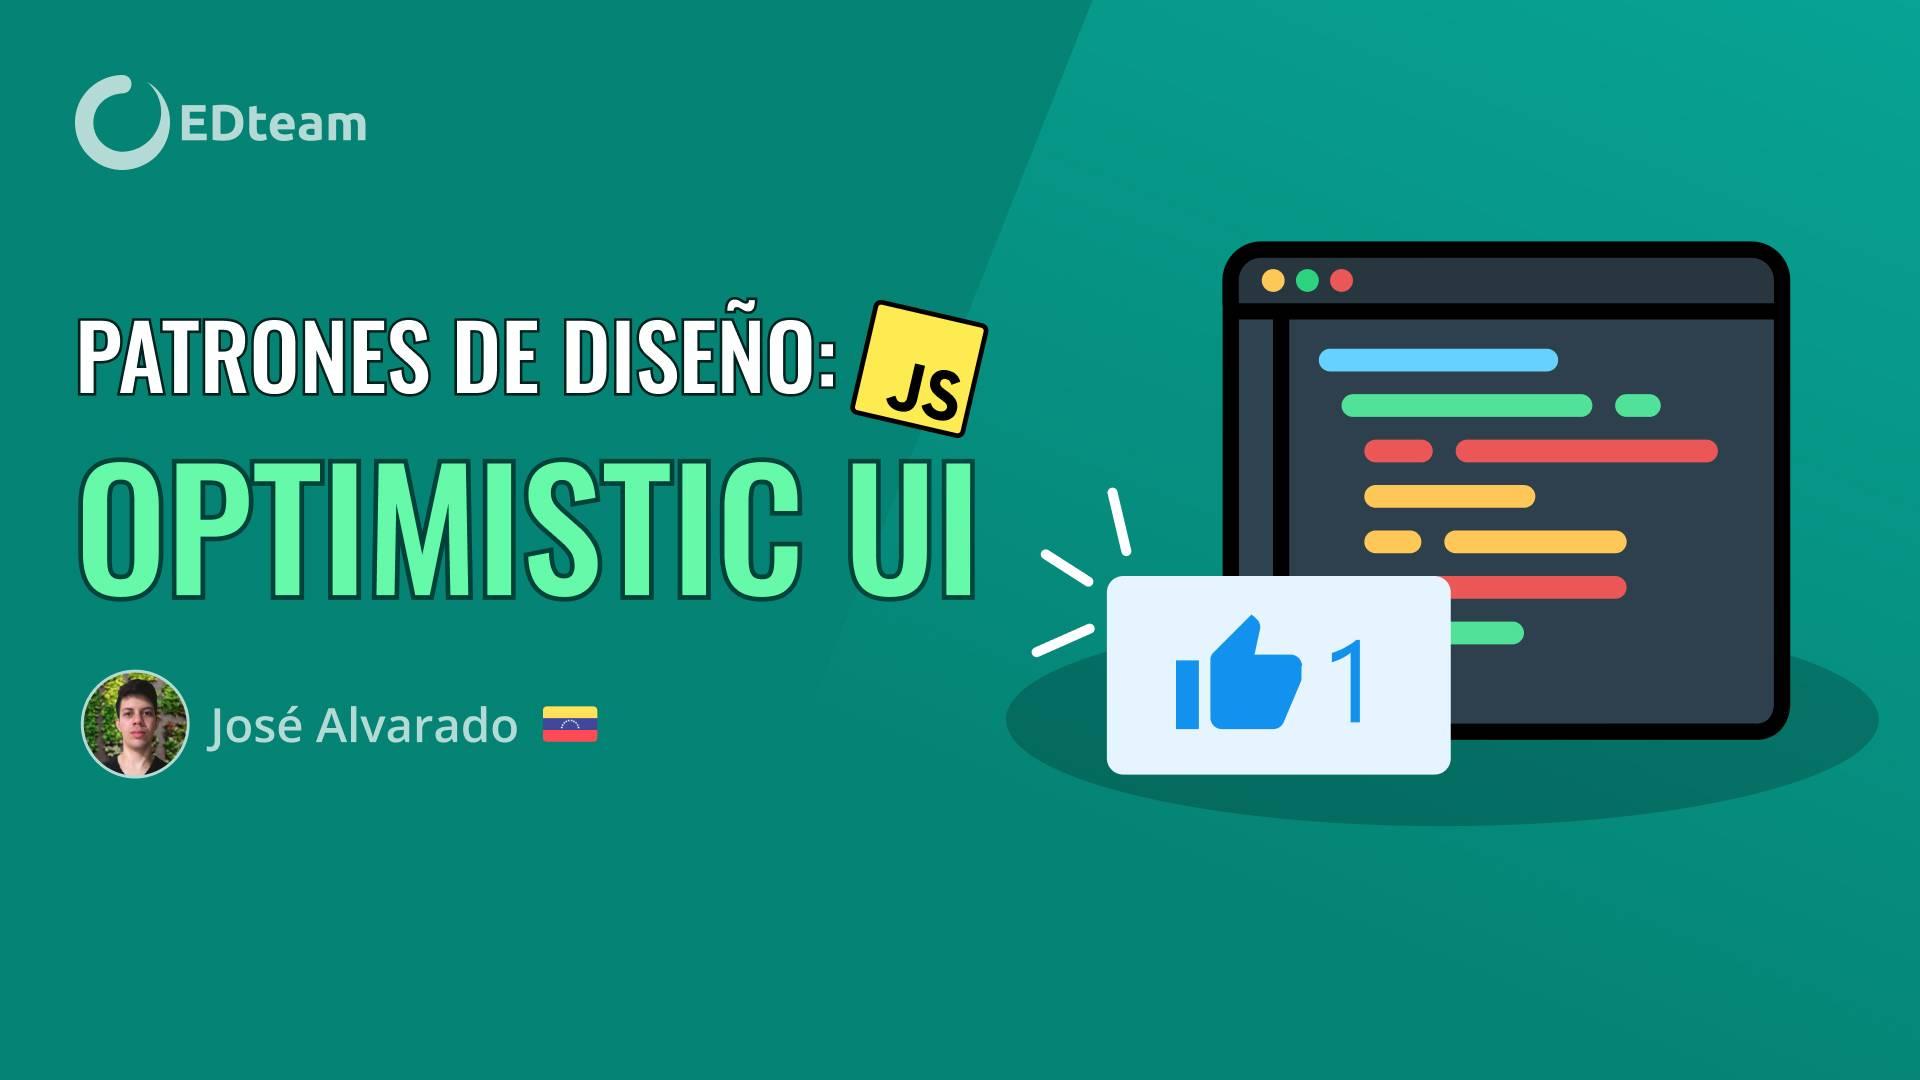 Patrones de diseño: Optimistic UI